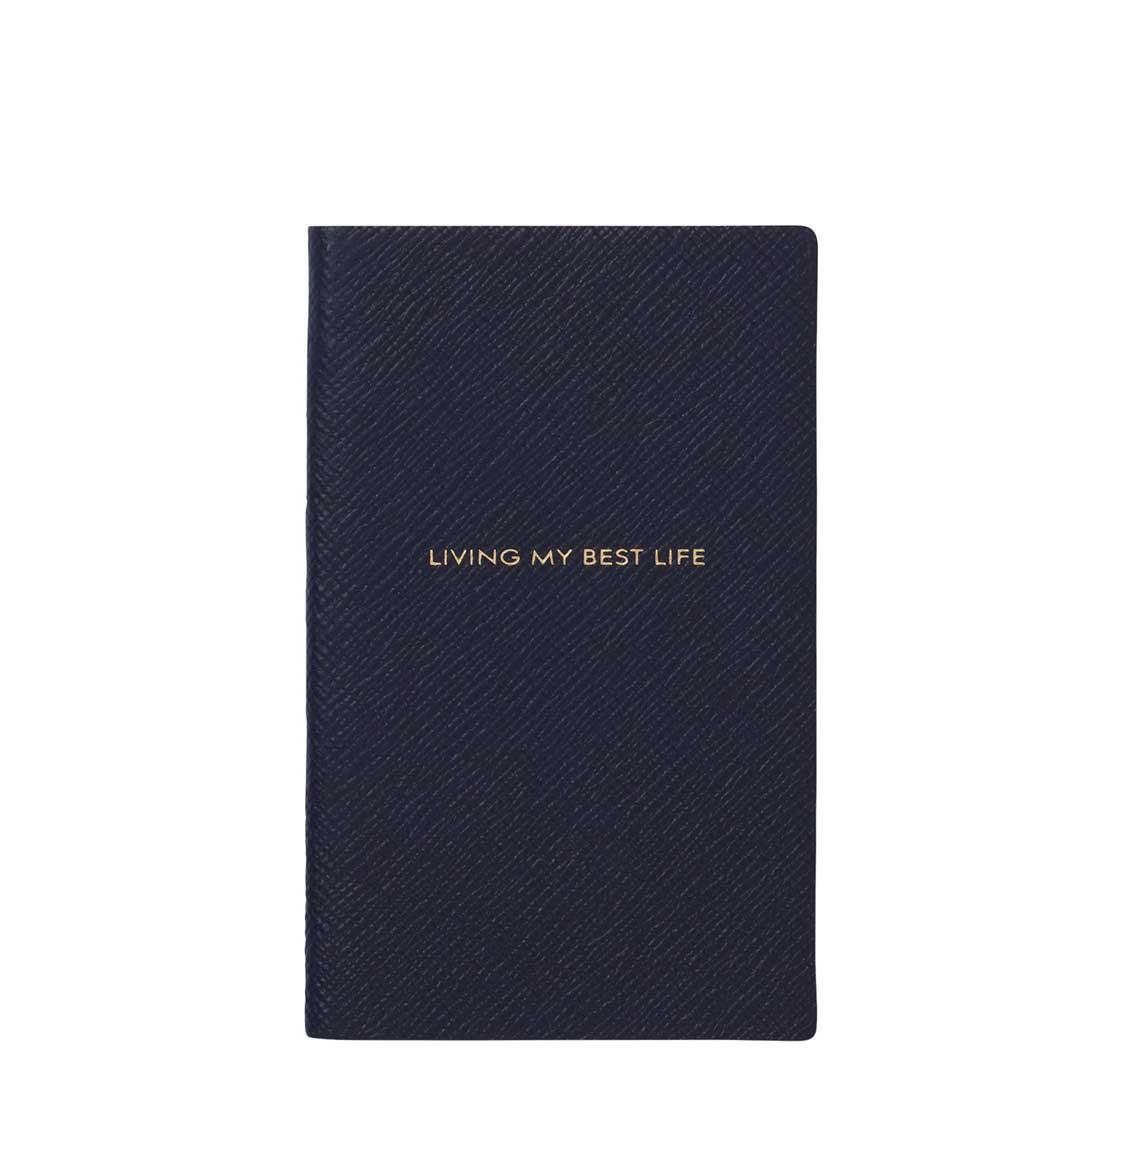 Smythson Living My Best Life Notebook